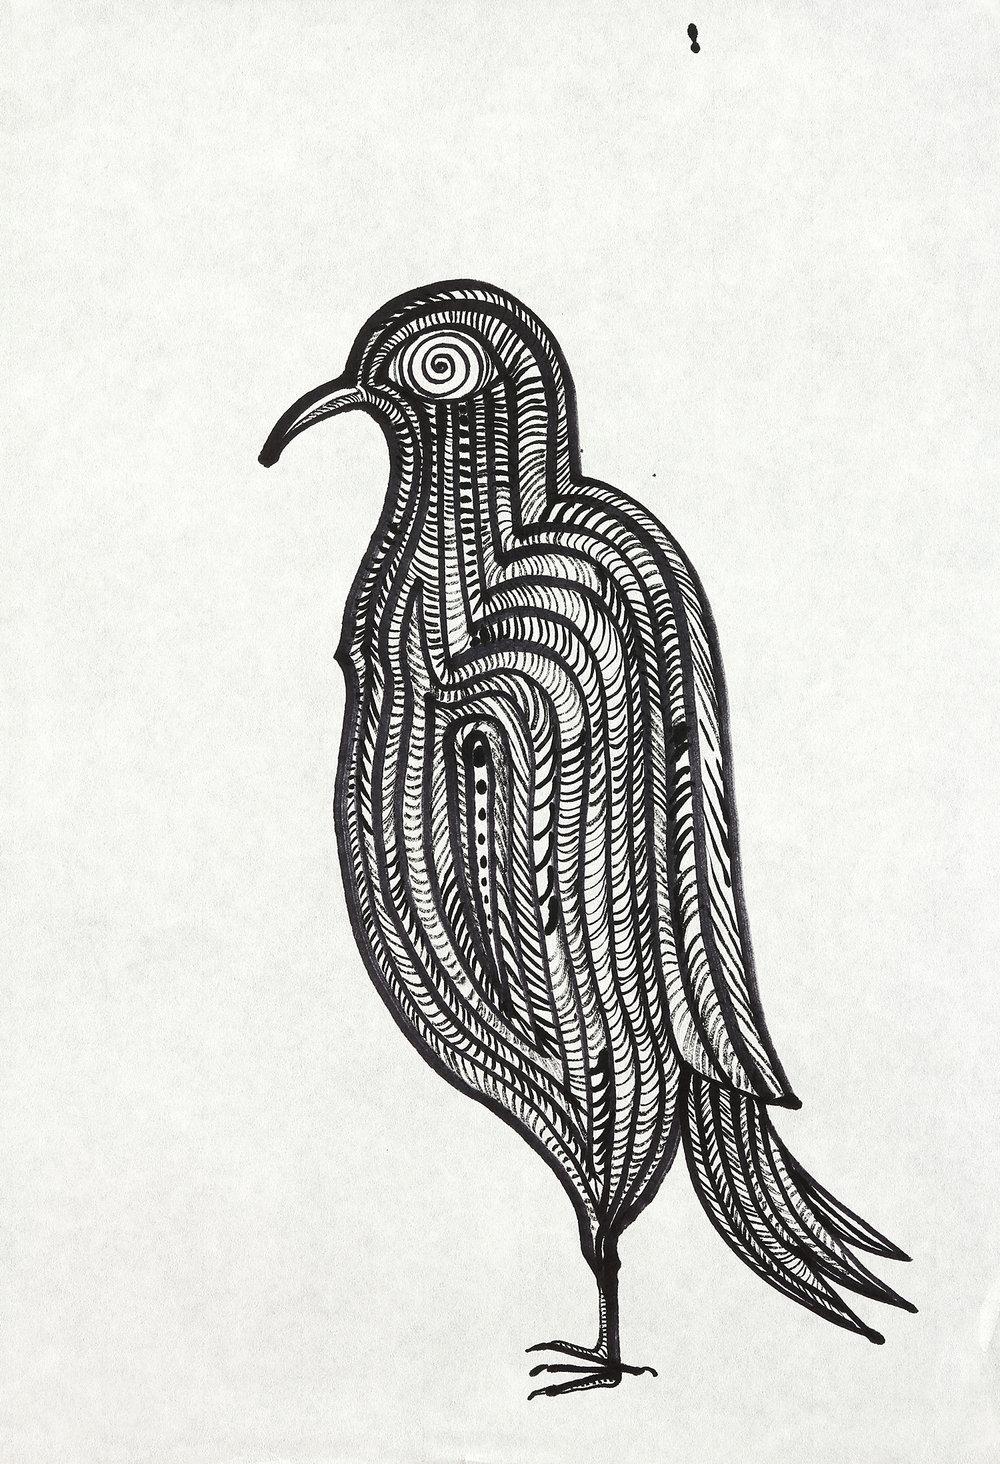 Standing Bird  sumi ink on paper  23x17in. 2016